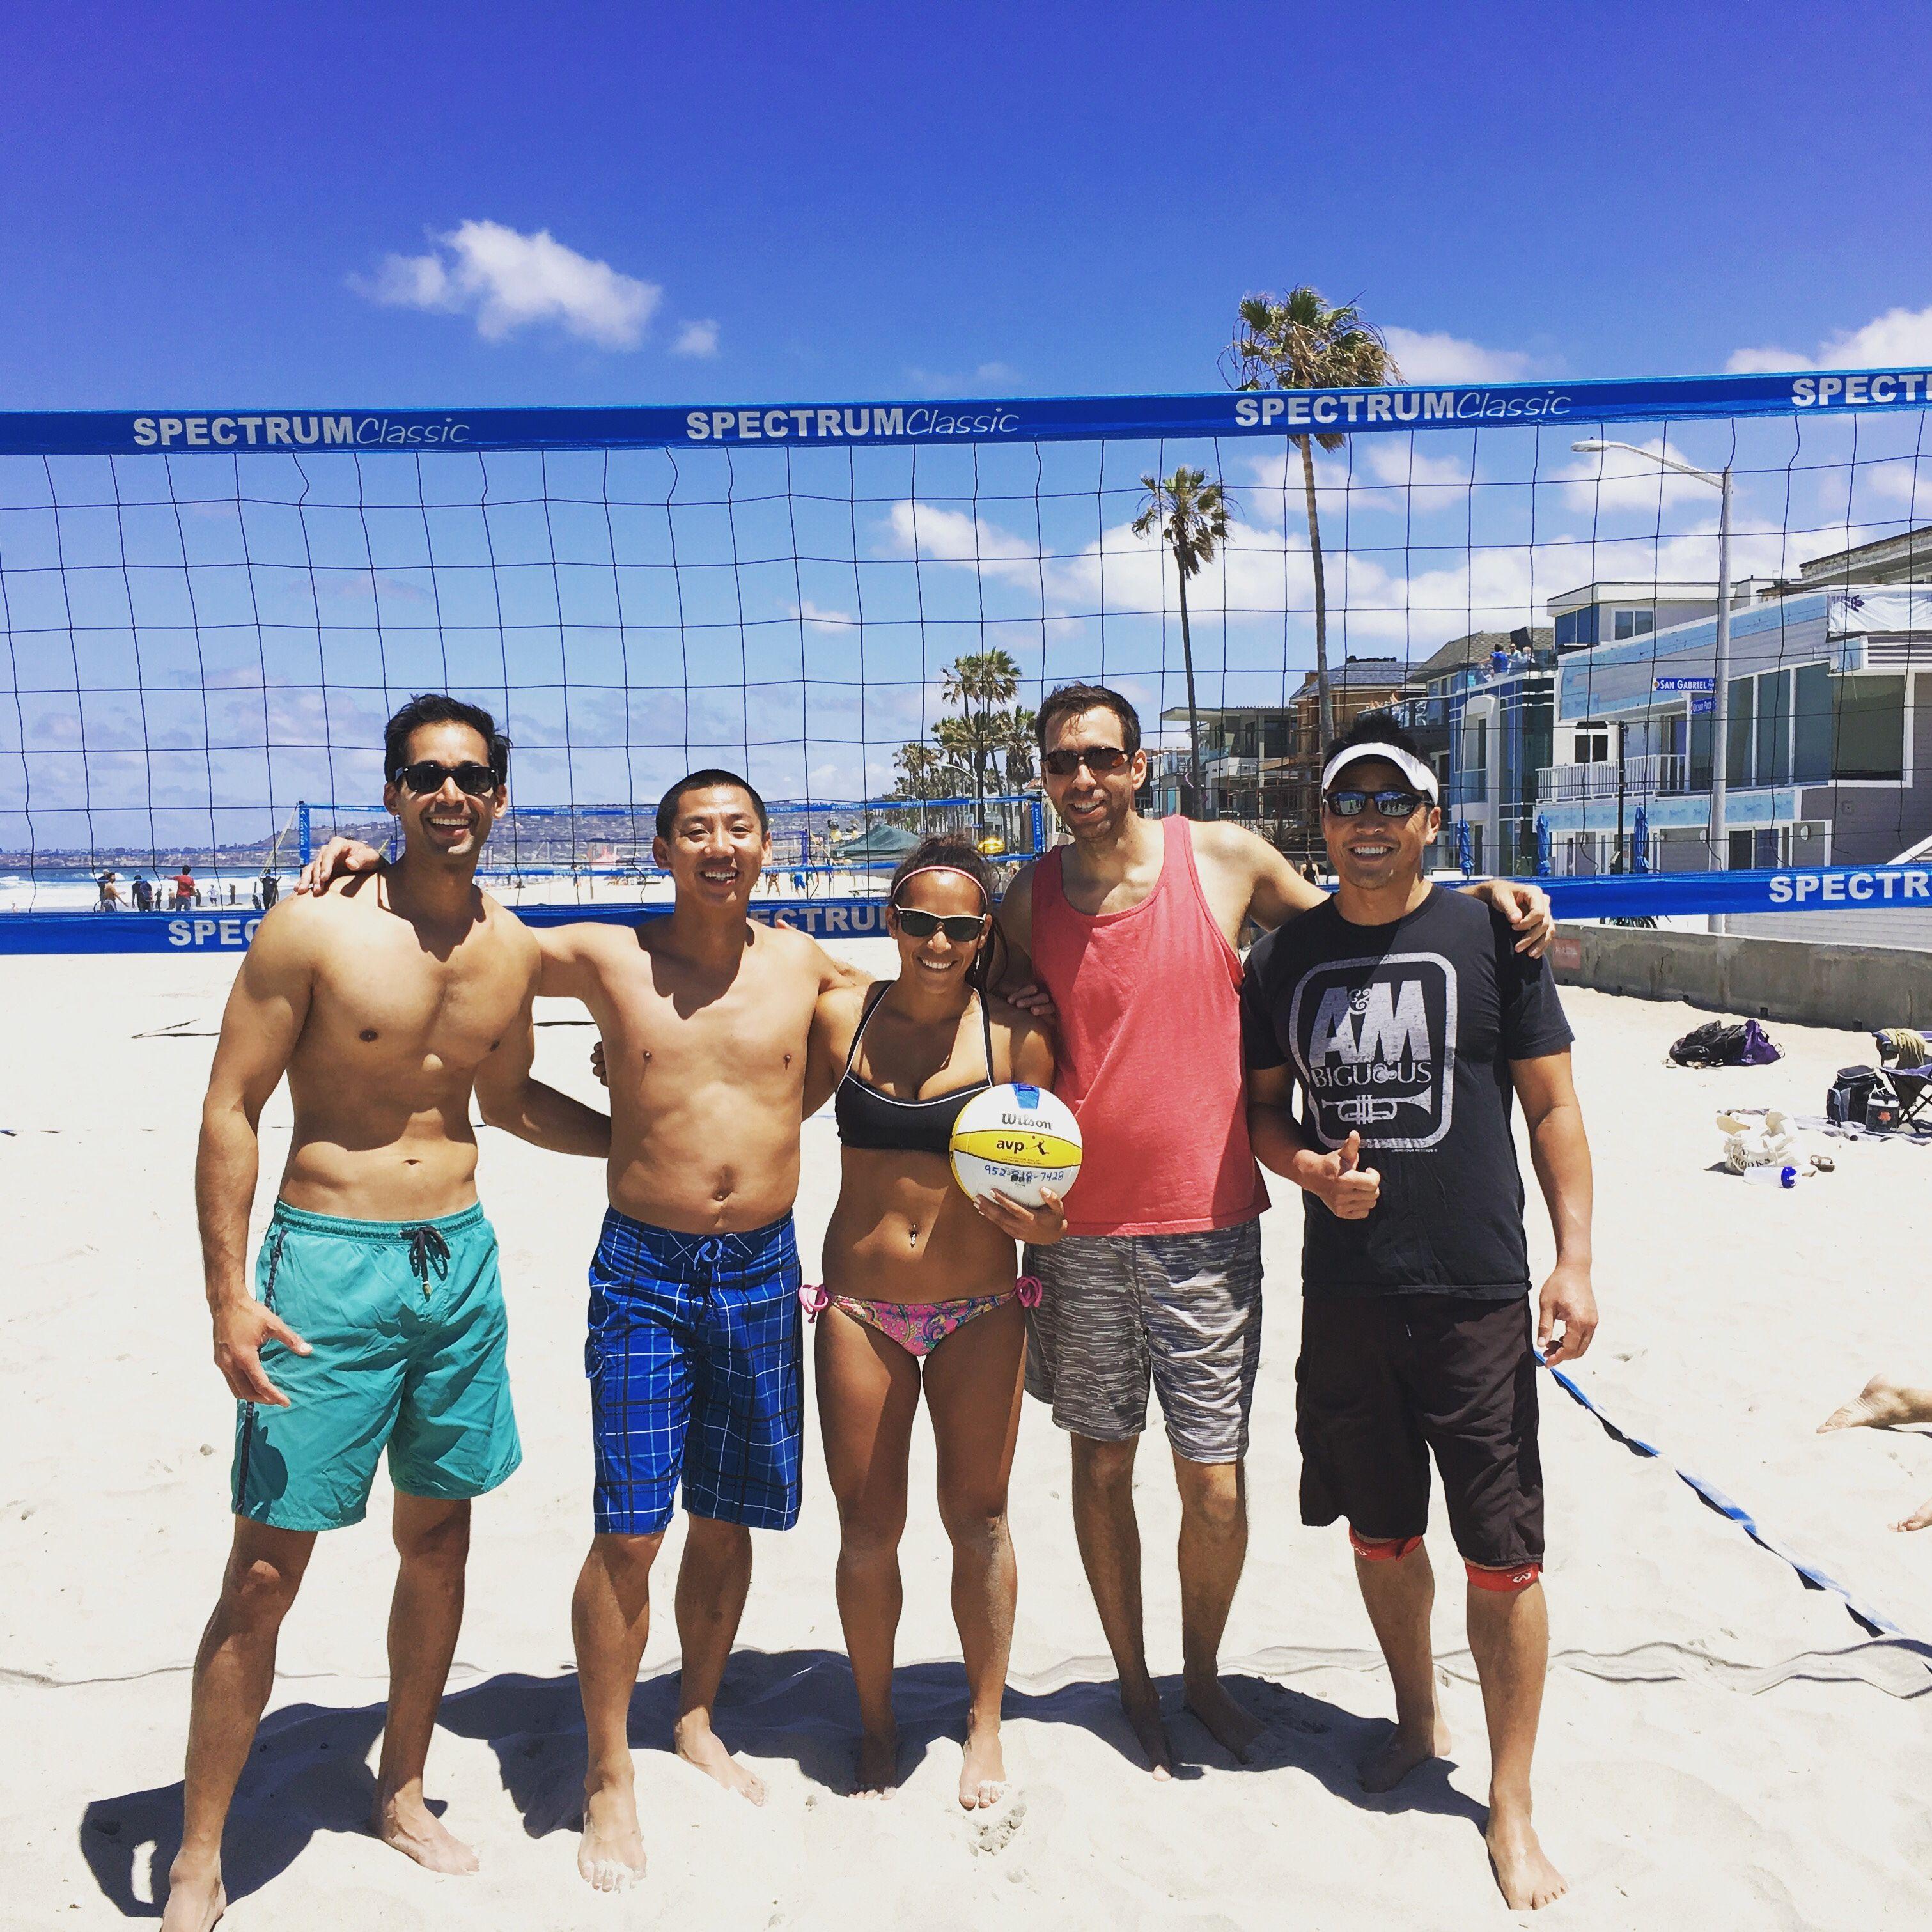 Photos - San Diego (Mostly) Beach Volleyball Meetup (San